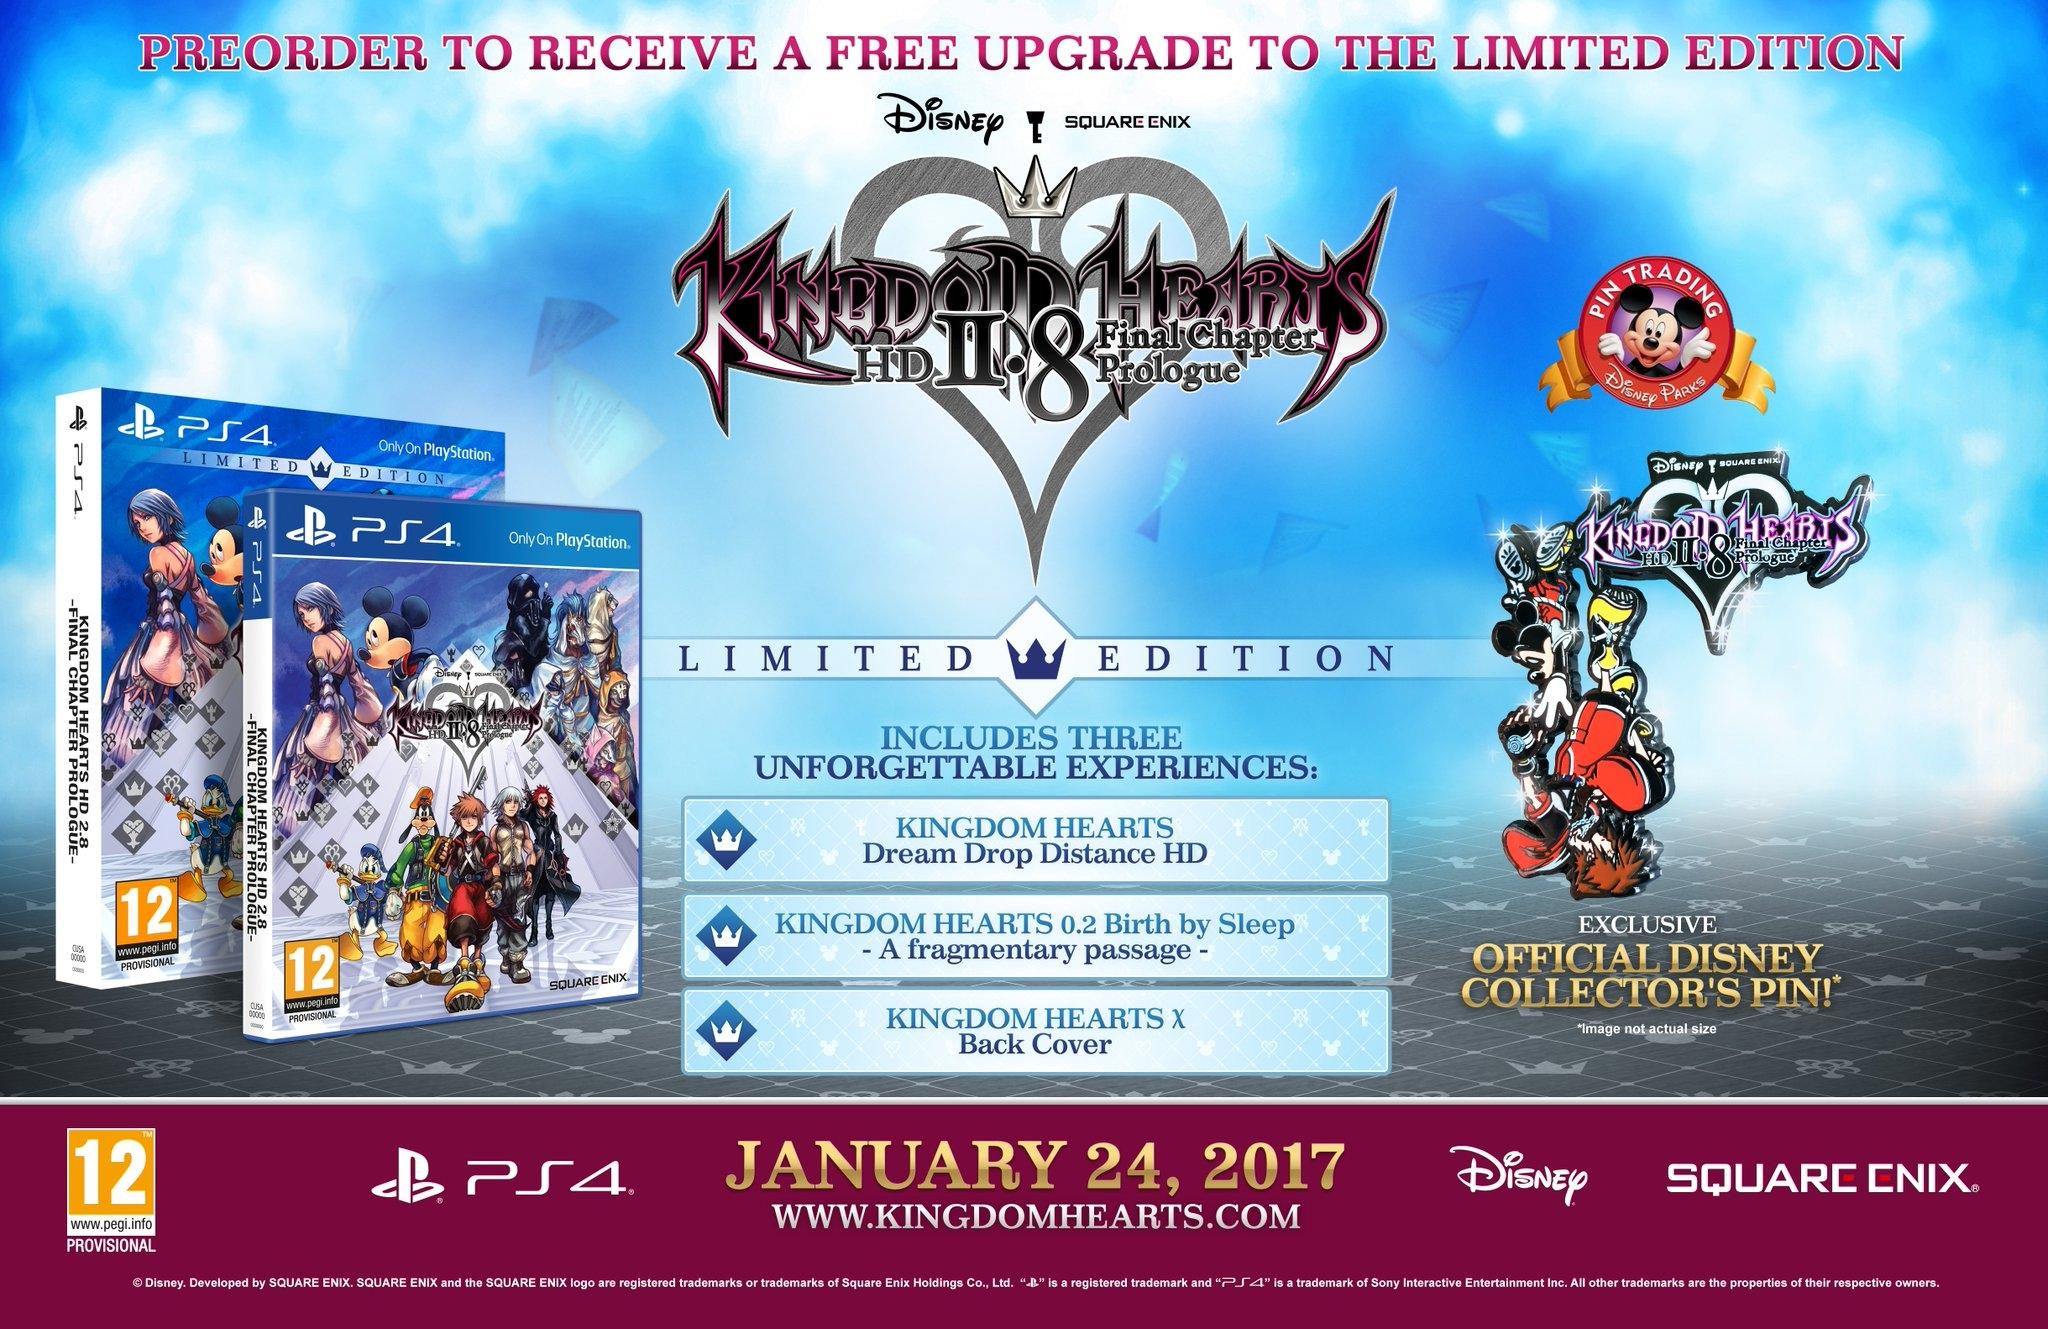 Limited Edition di Kingdom Hearts II.8 HD